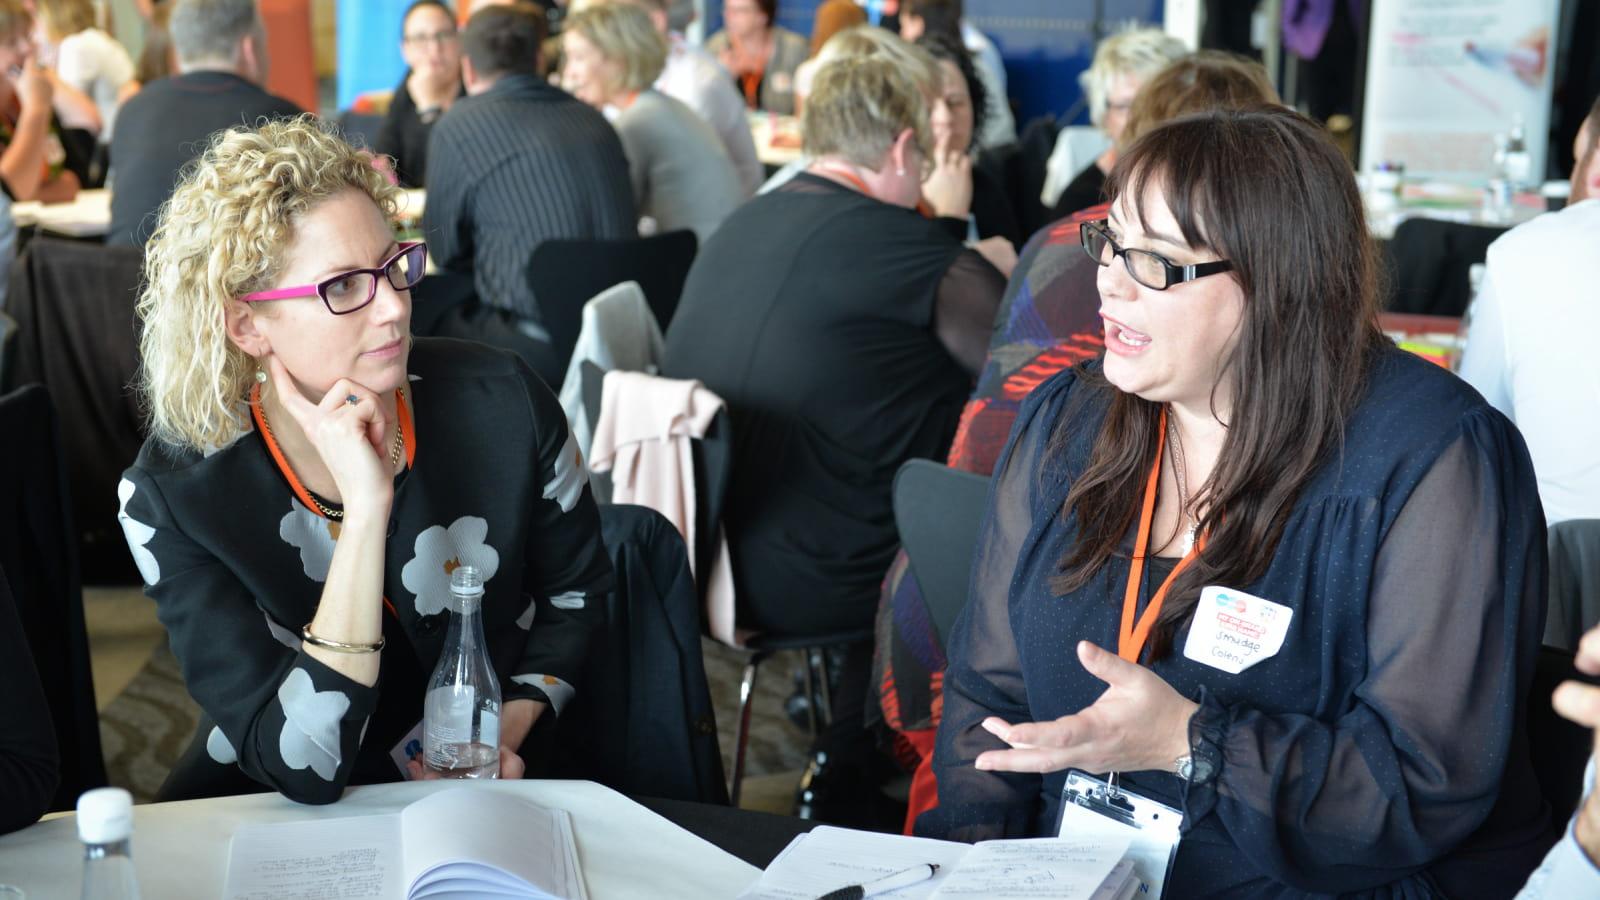 Women engaged in conversation